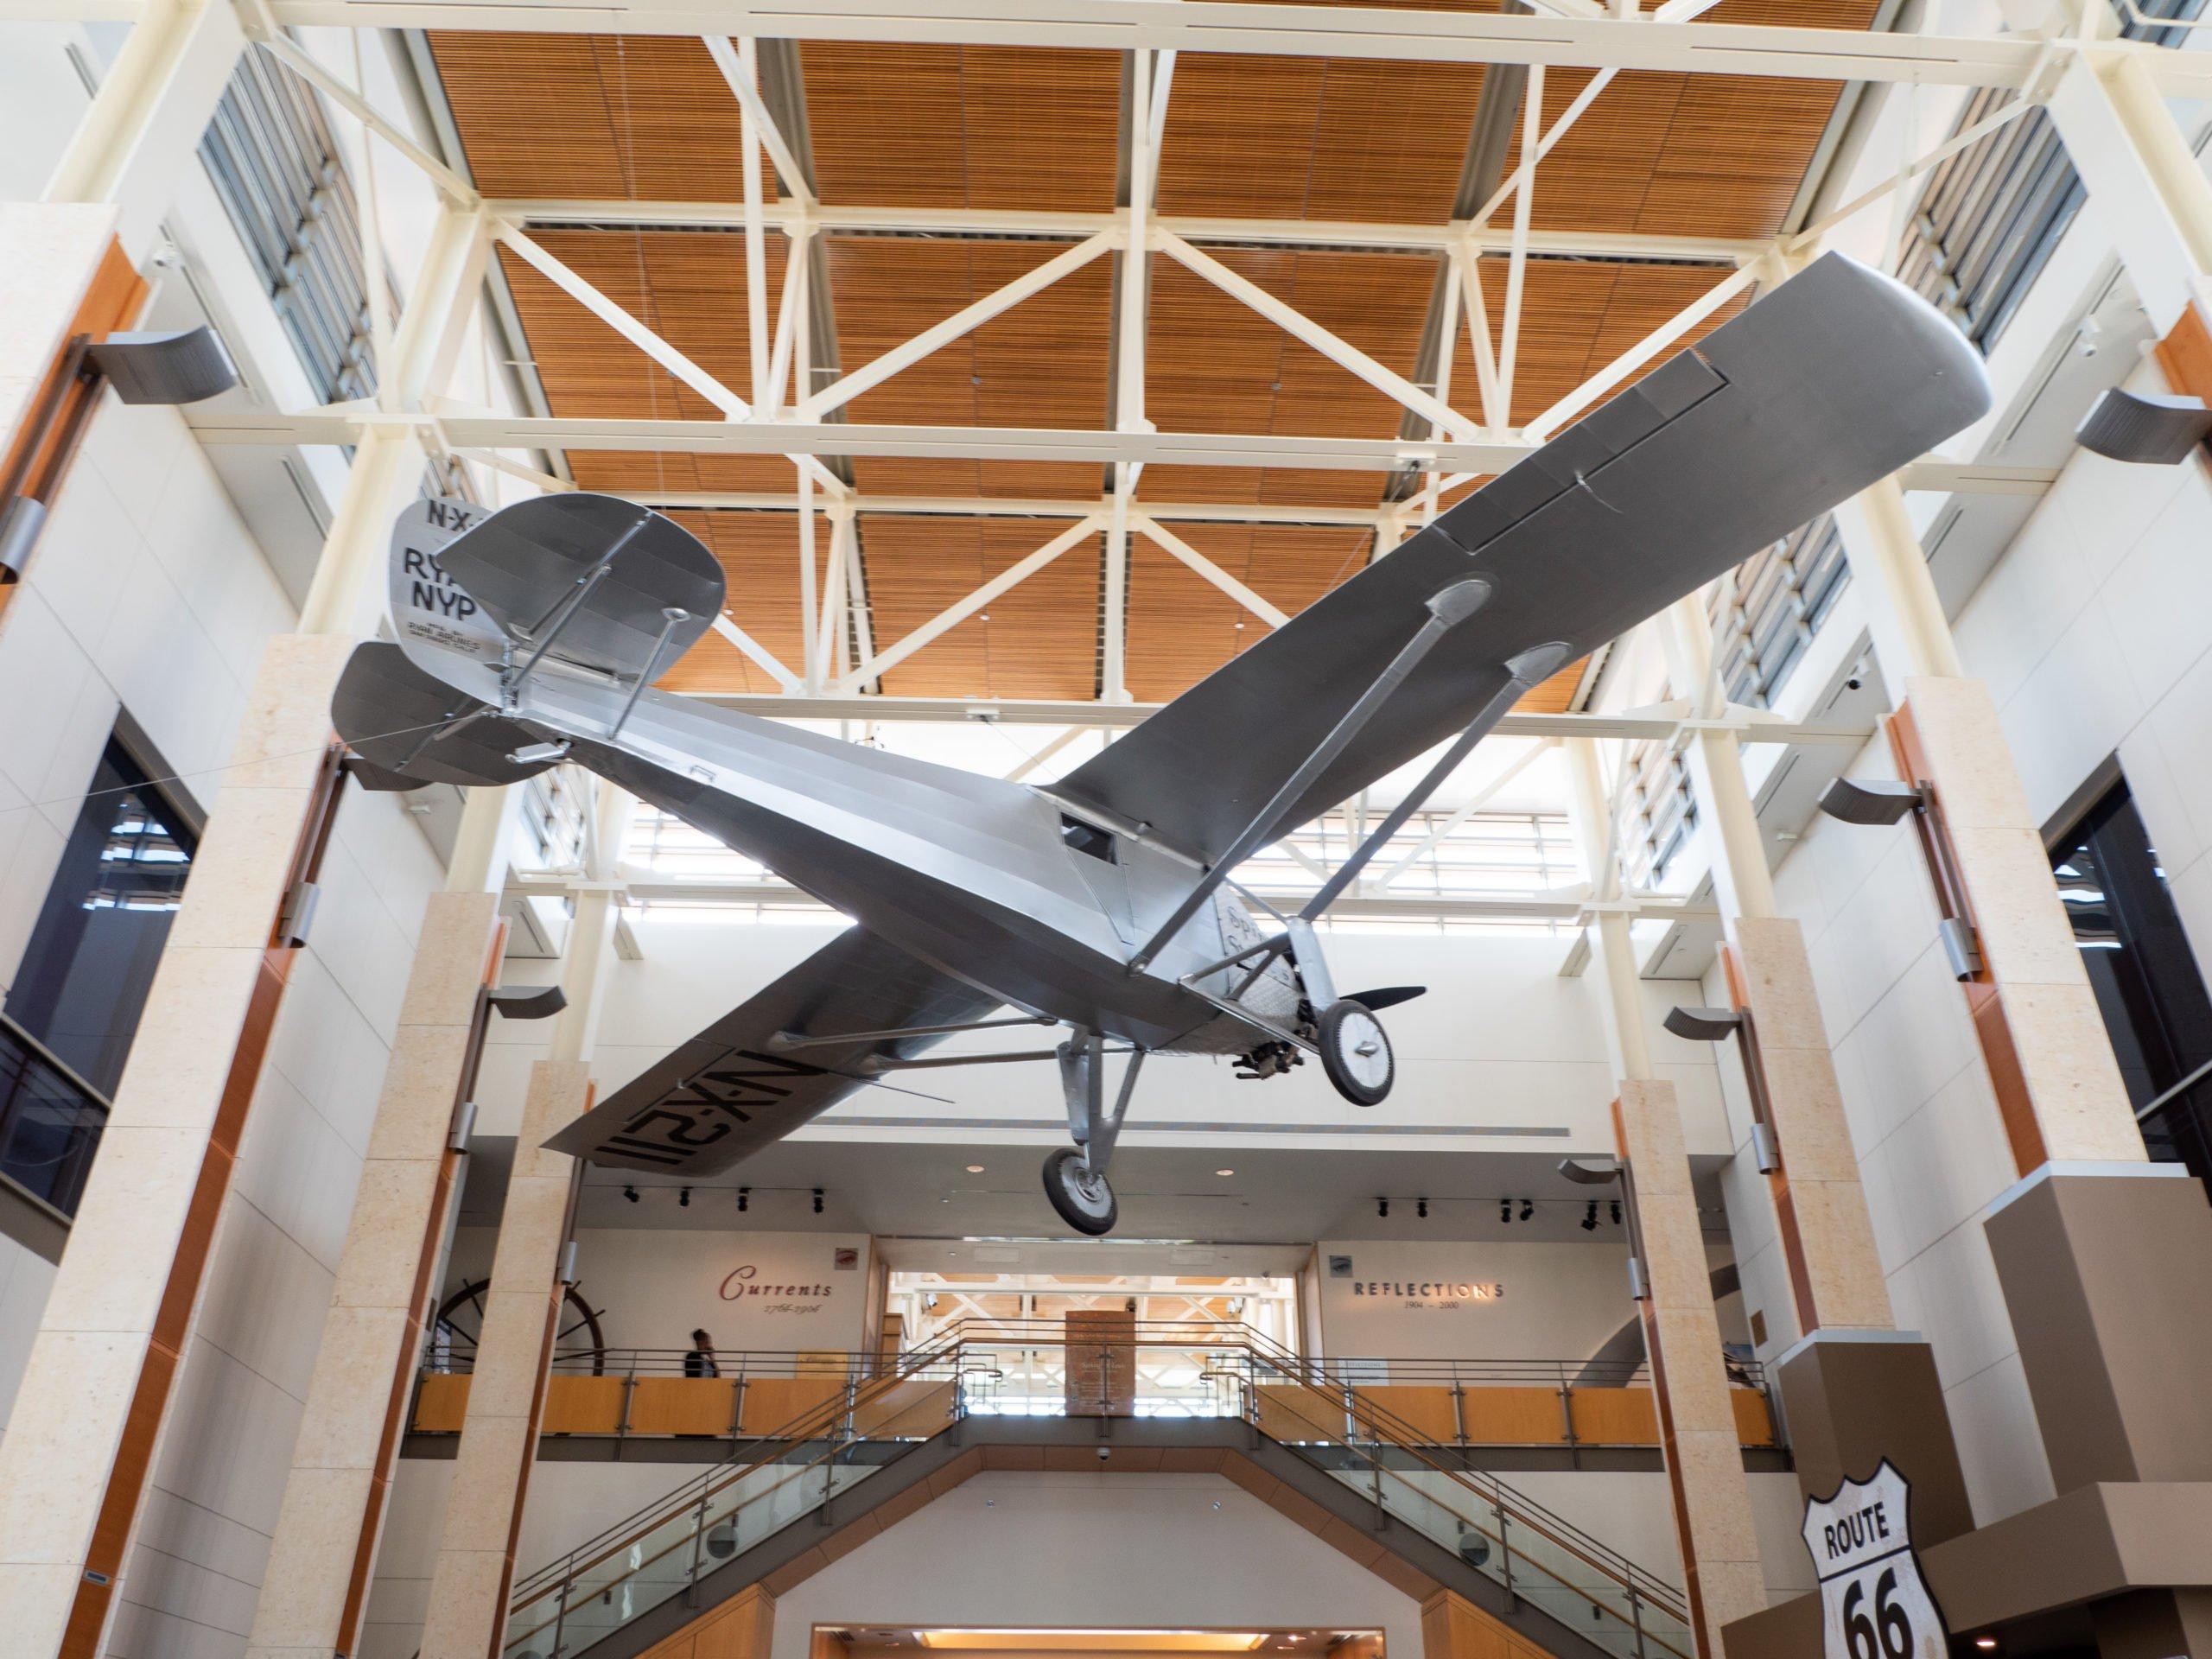 Spirit of St. Louis airplane at Missouri History Museum (photo: Jonathan Cutrer)